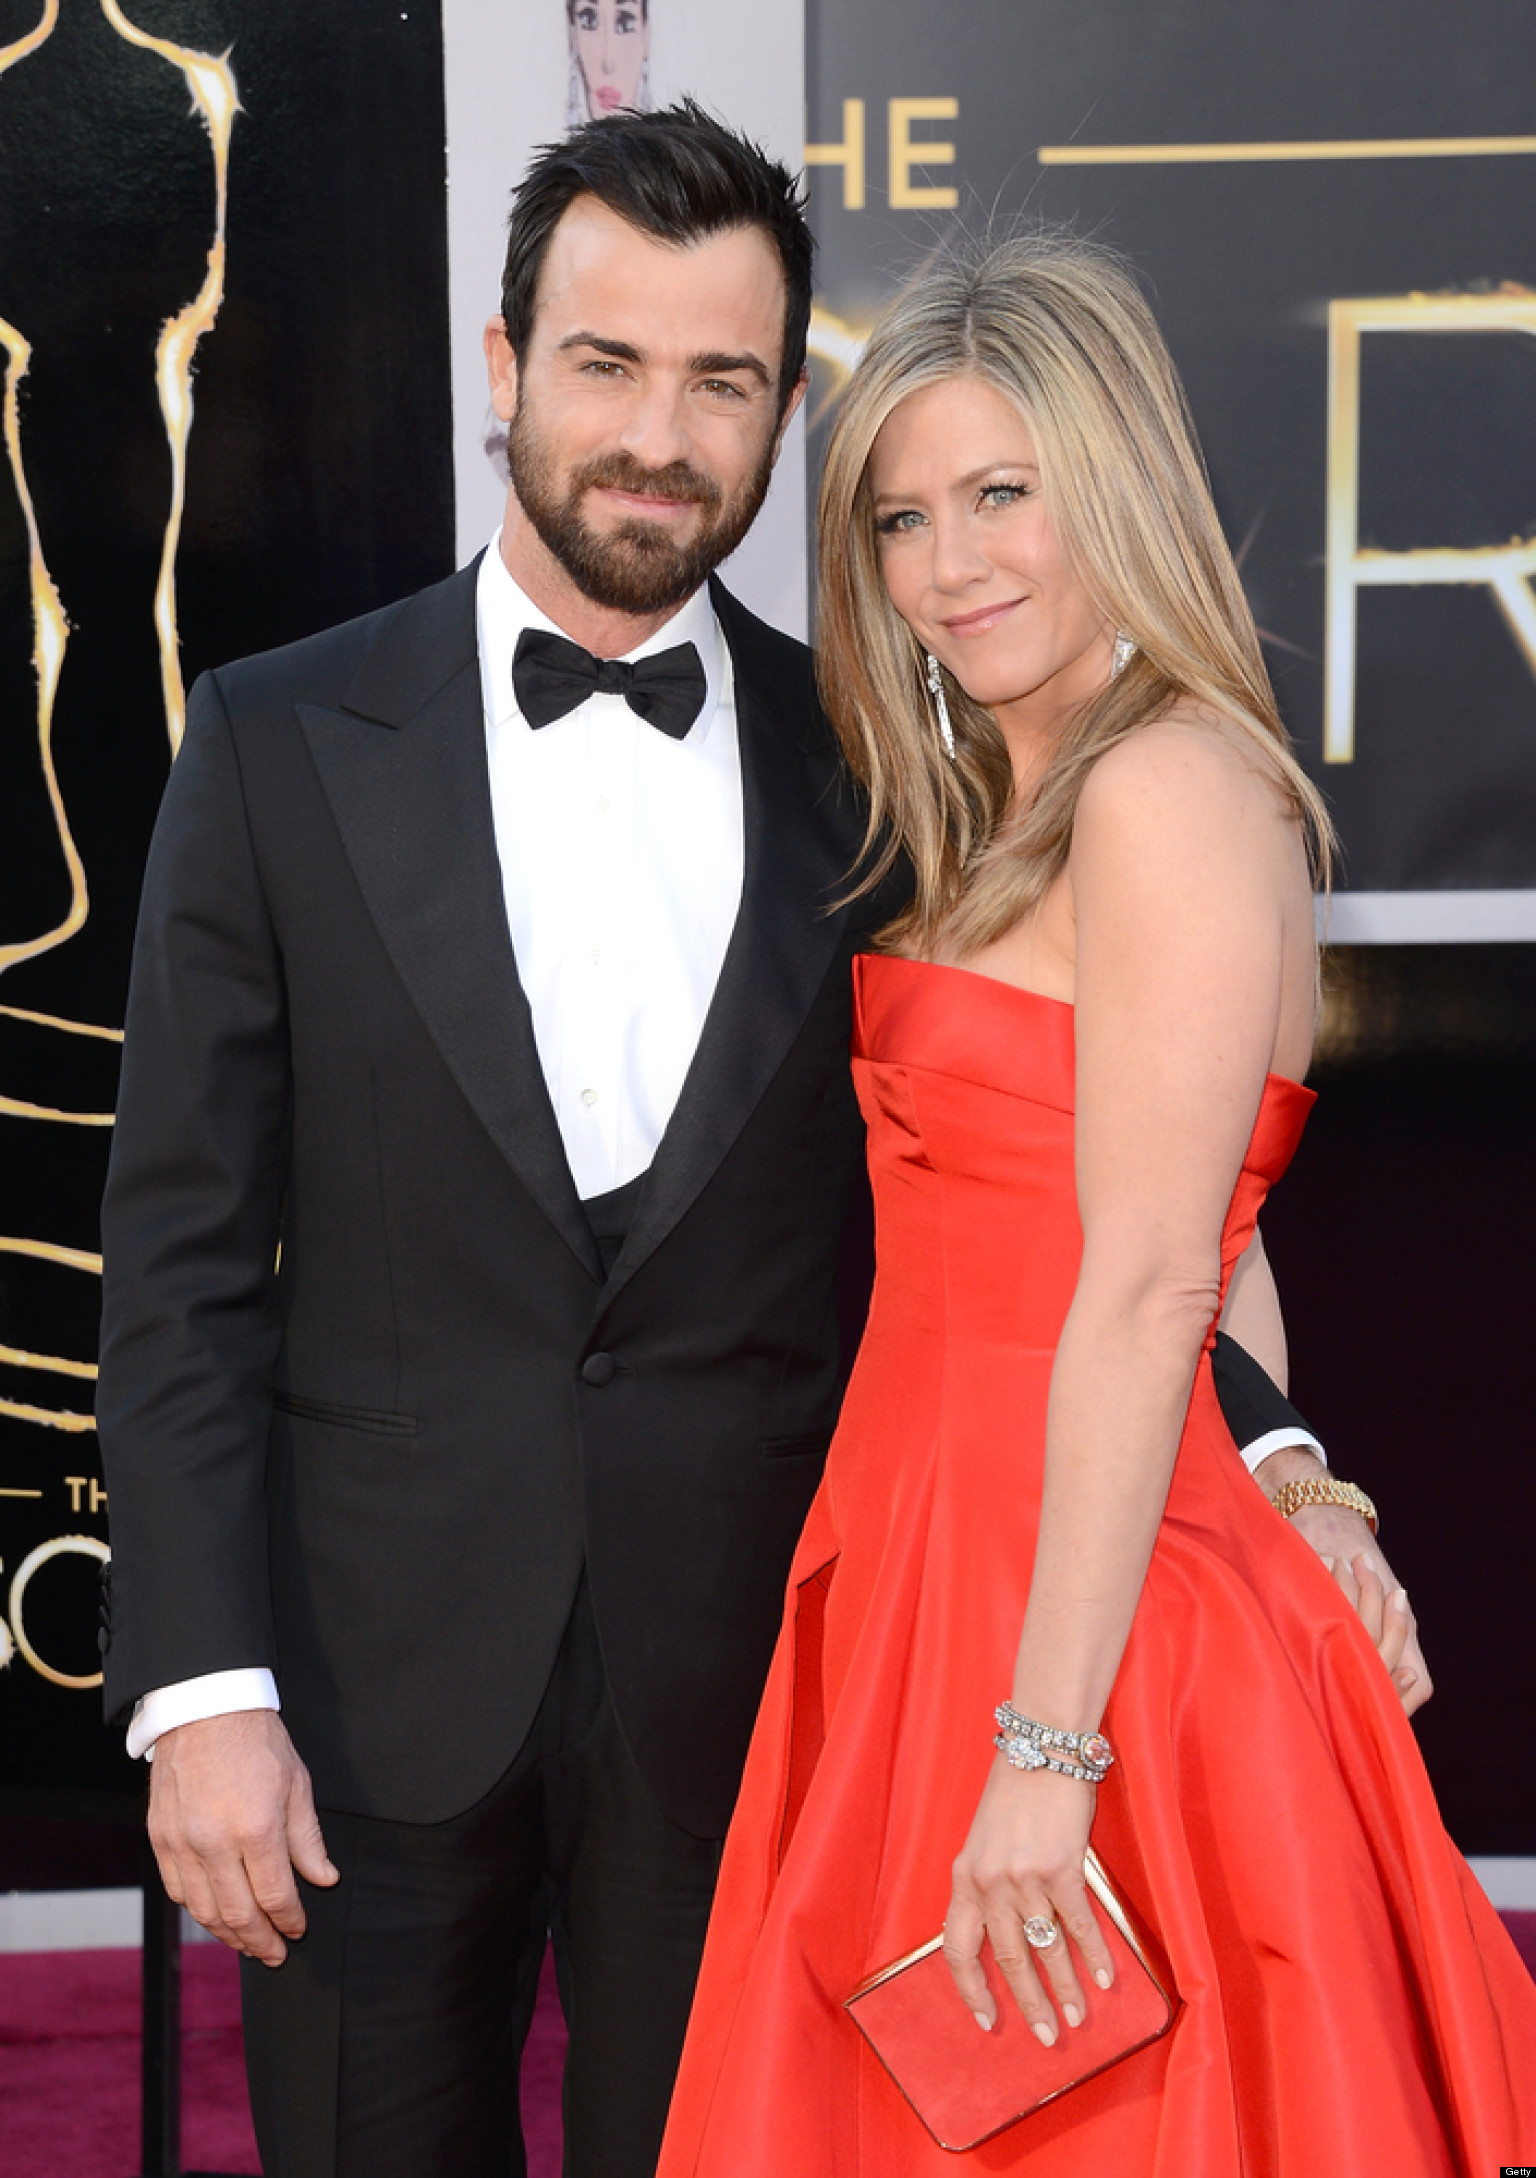 Jennifer Aniston And Justin Theroux Engaged Jennifer Aniston's Wed...